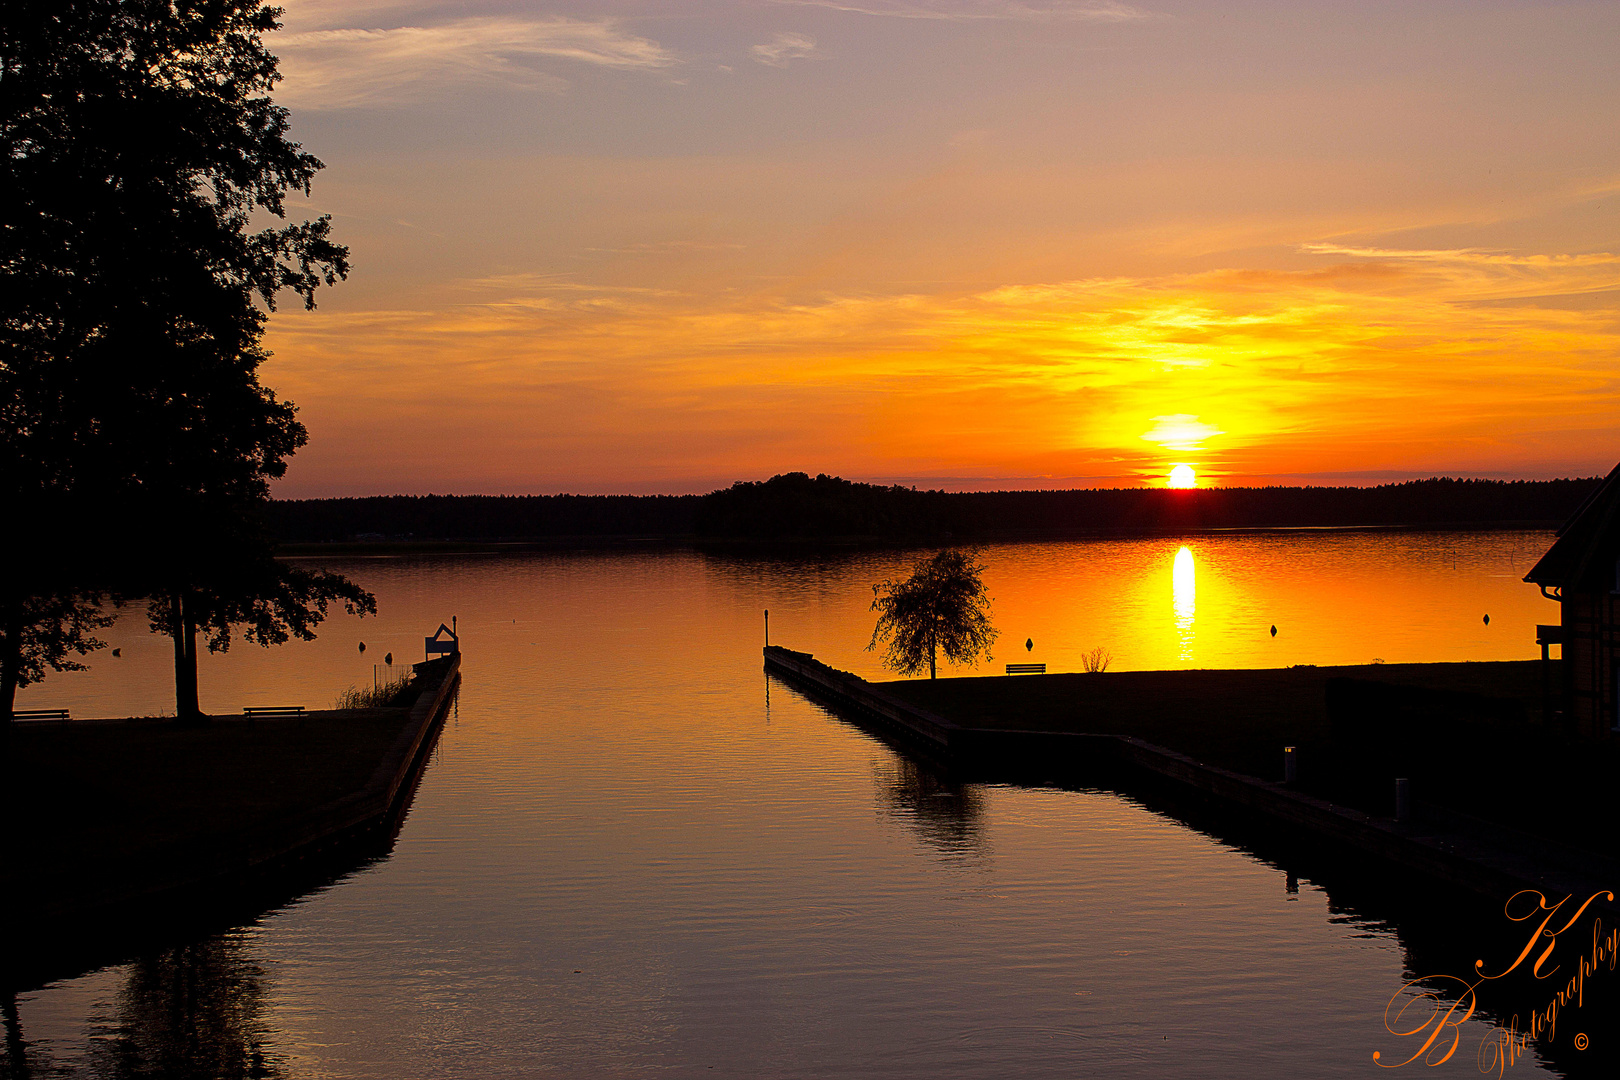 Sonnenuntergang Rheinsbergerr See